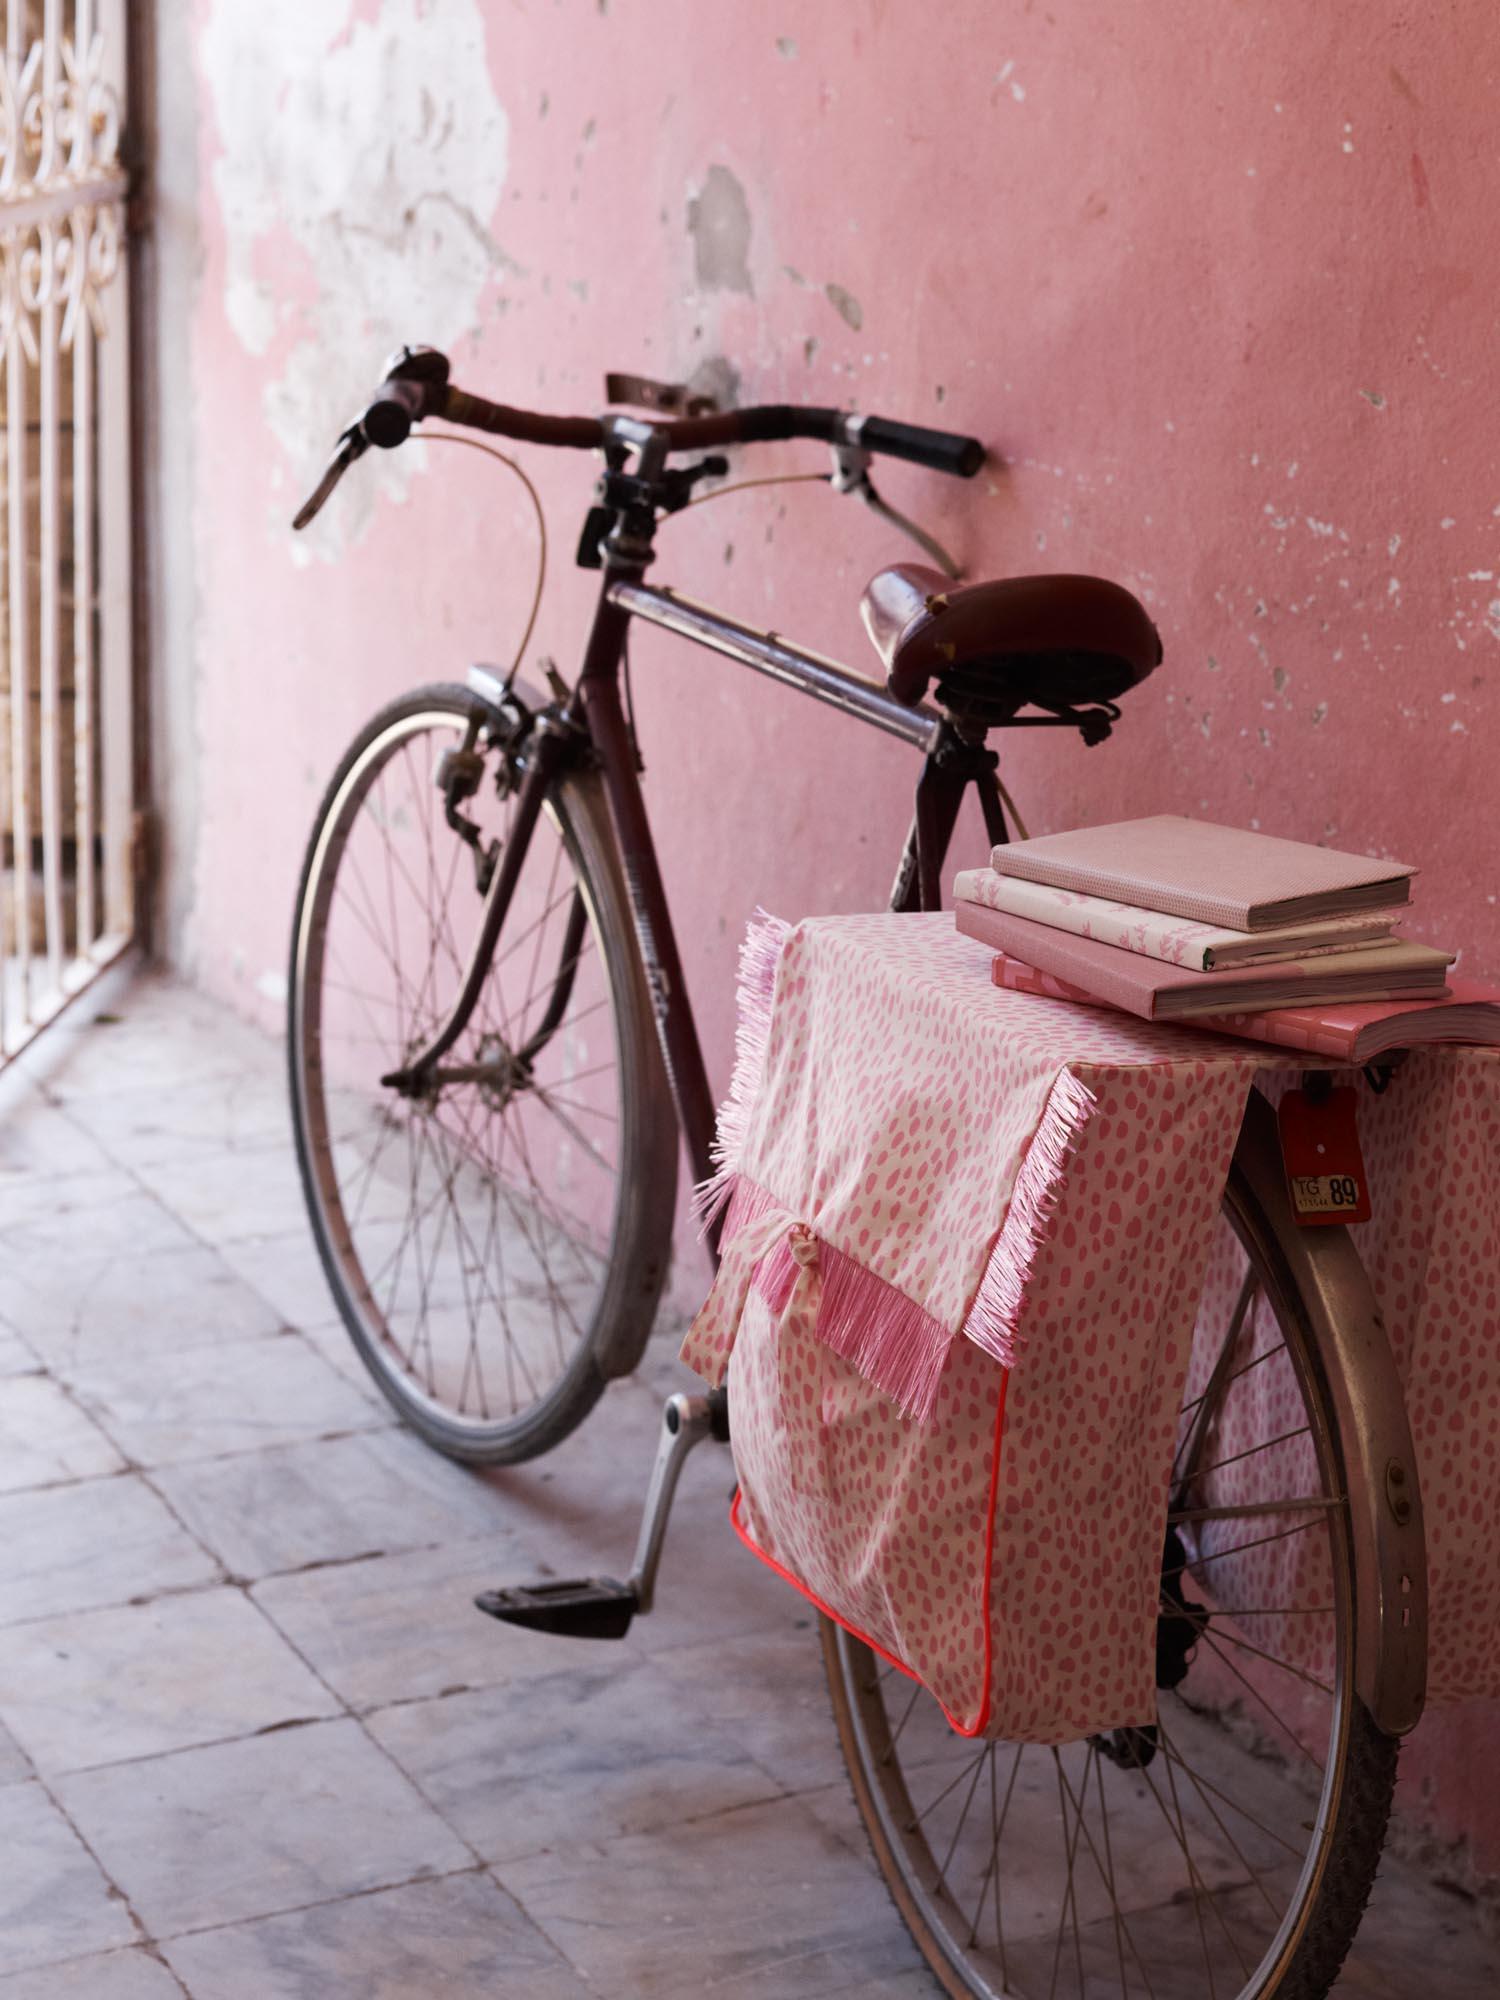 24.HomesAndGardensJul10TomLeightonKateFrenchAliBrownMoroccoBike.jpg